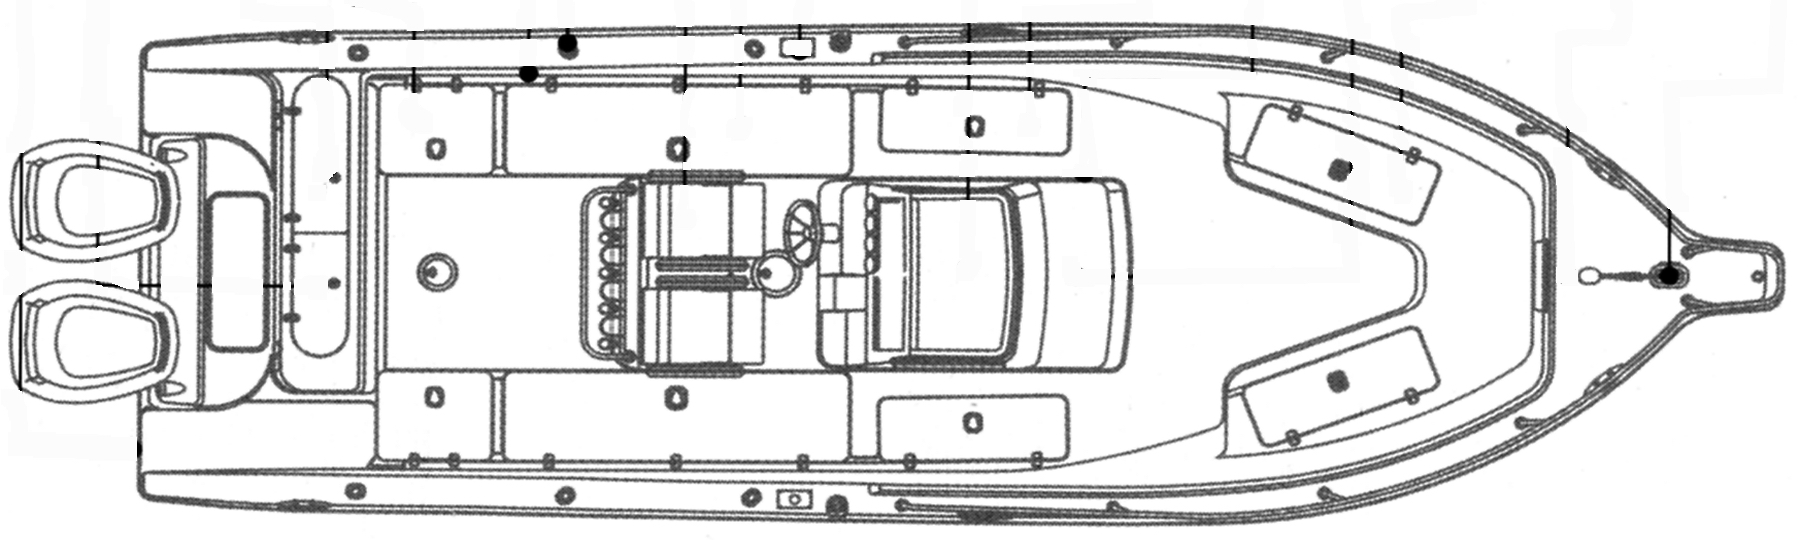 Century 2900-2901 Center Console Floor Plan 2